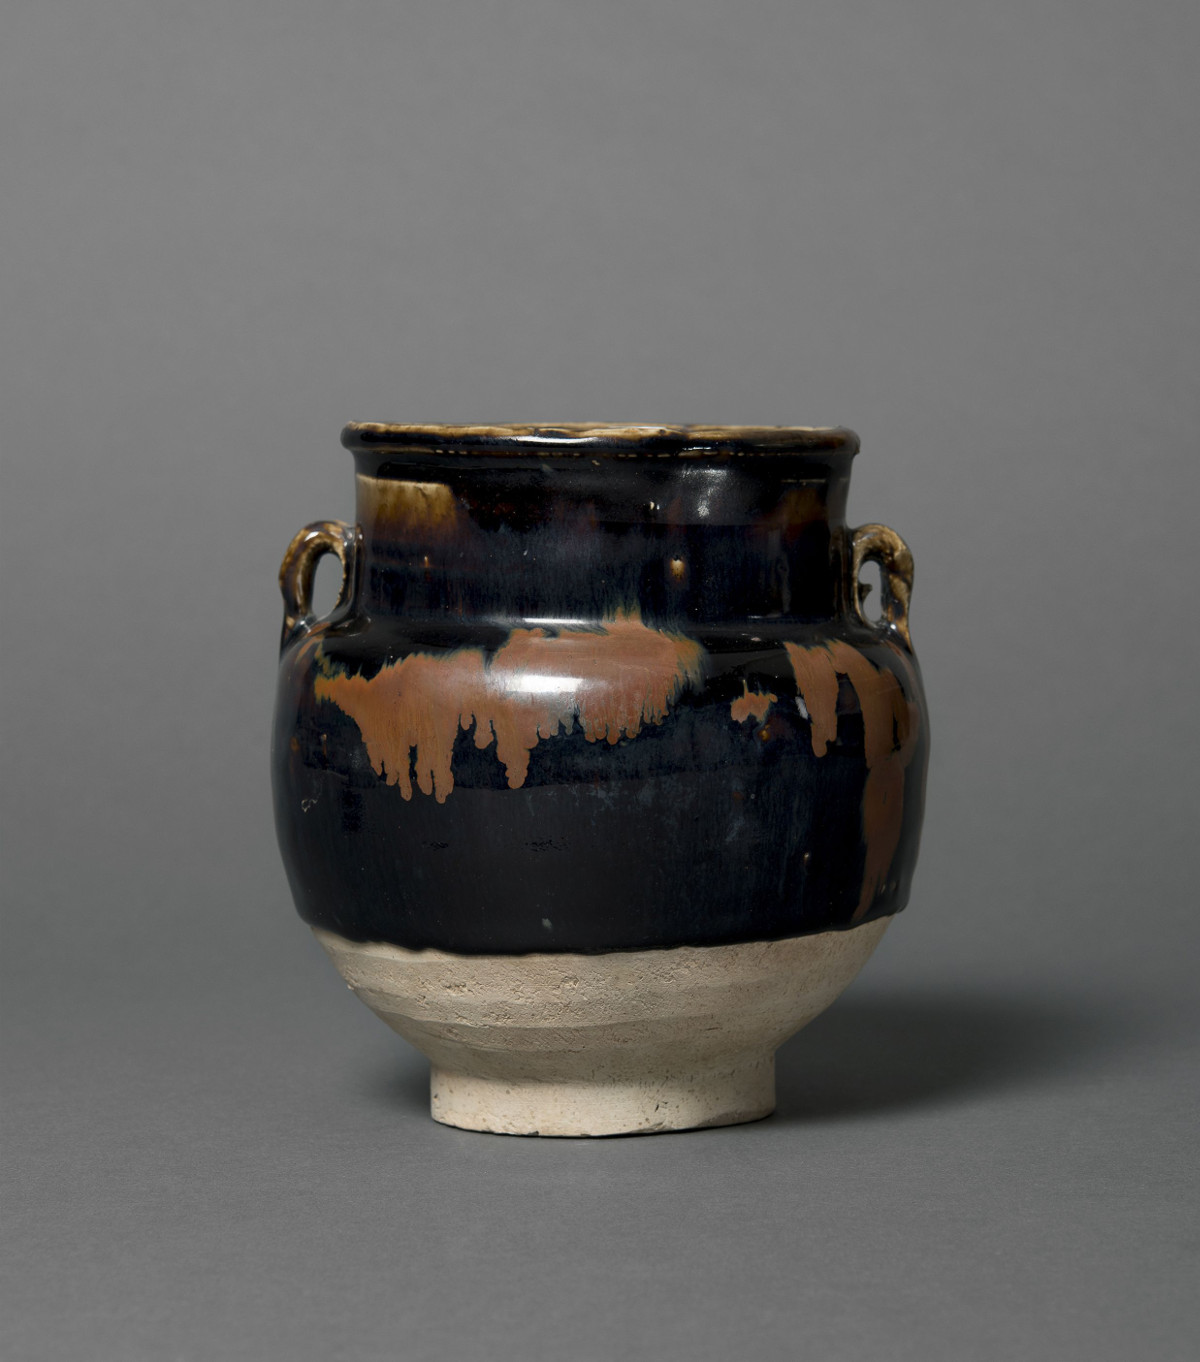 Topf mit Ösenhenkeln, Jizhou-Ware, Steinzeug, China, Song-Dynastie (960–1279) Schenkung Dr. Heribert Meurer, 2017. (Foto: Paul Altmann)